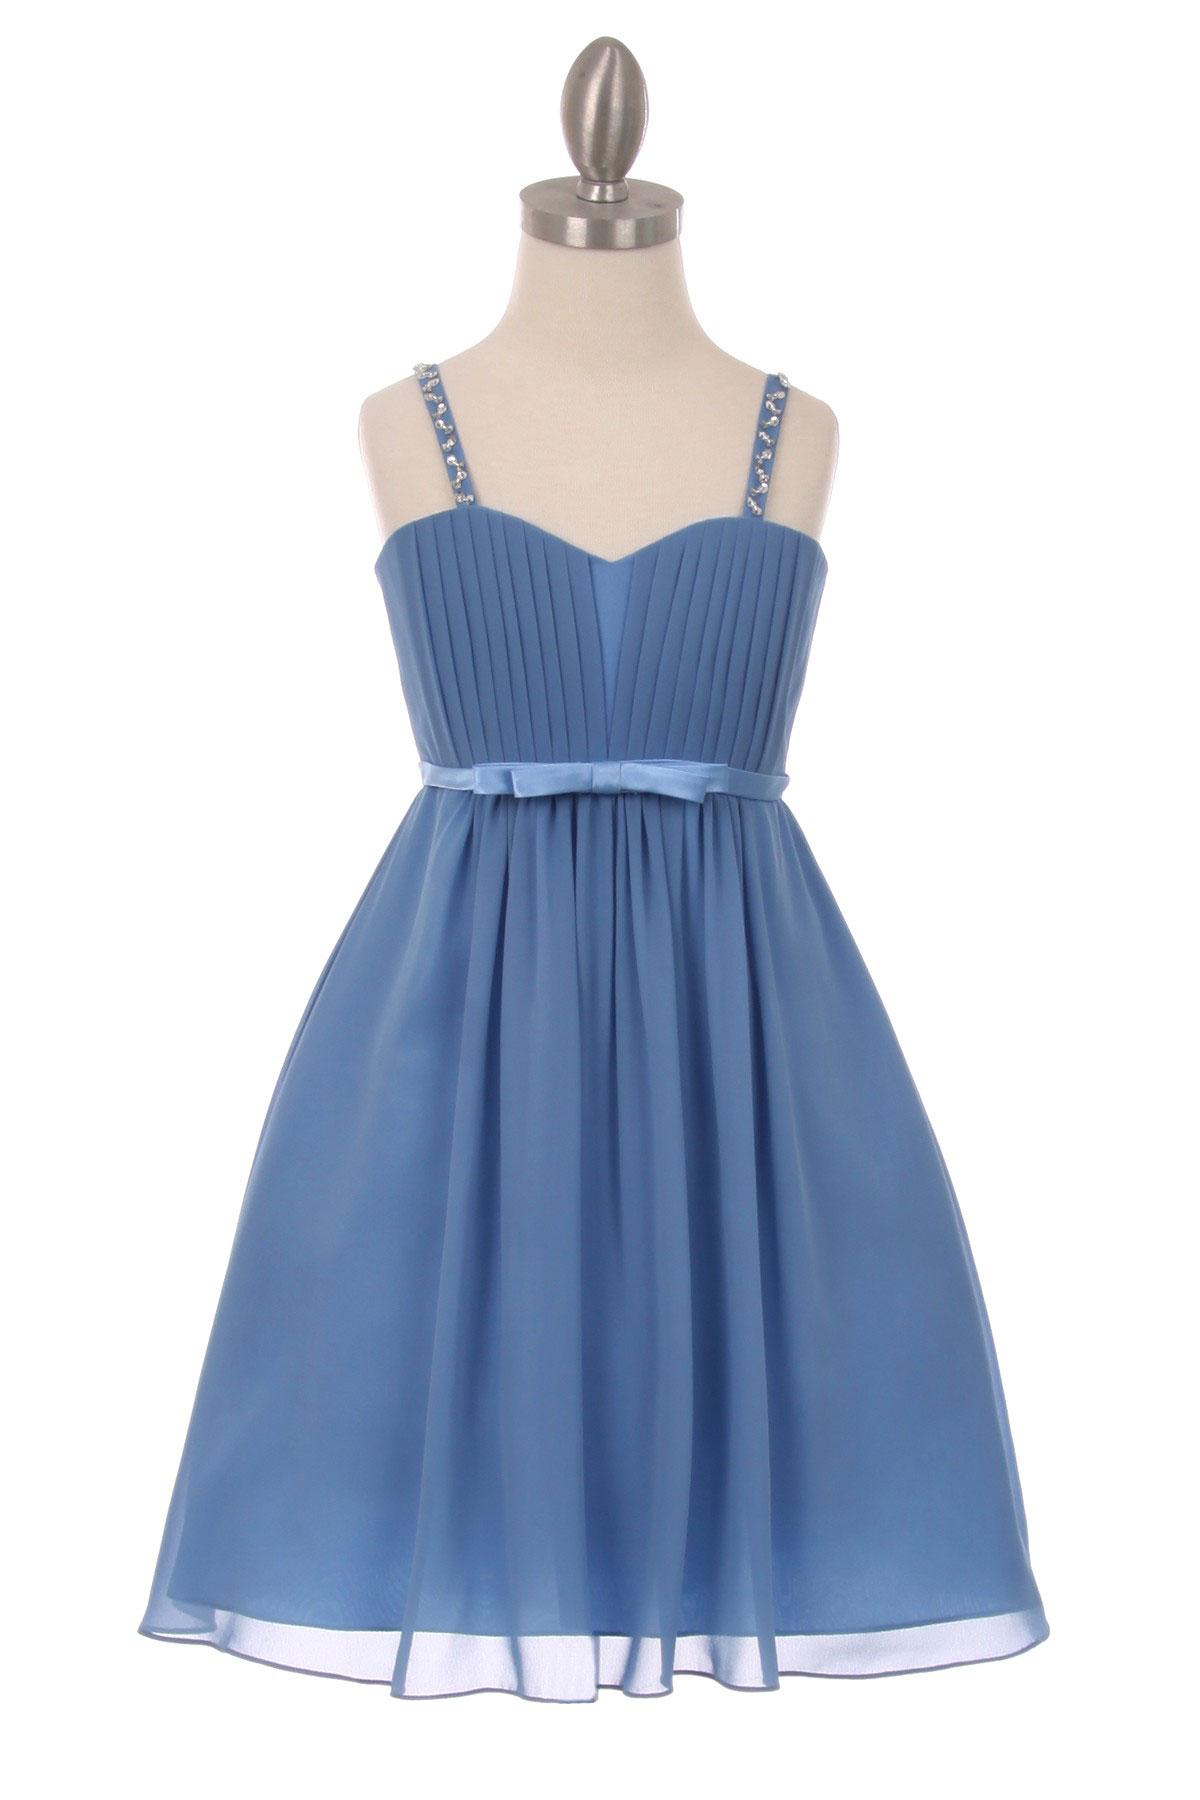 Cc 5012db Girls Dress Style 5012 Pleated Chiffon Dress